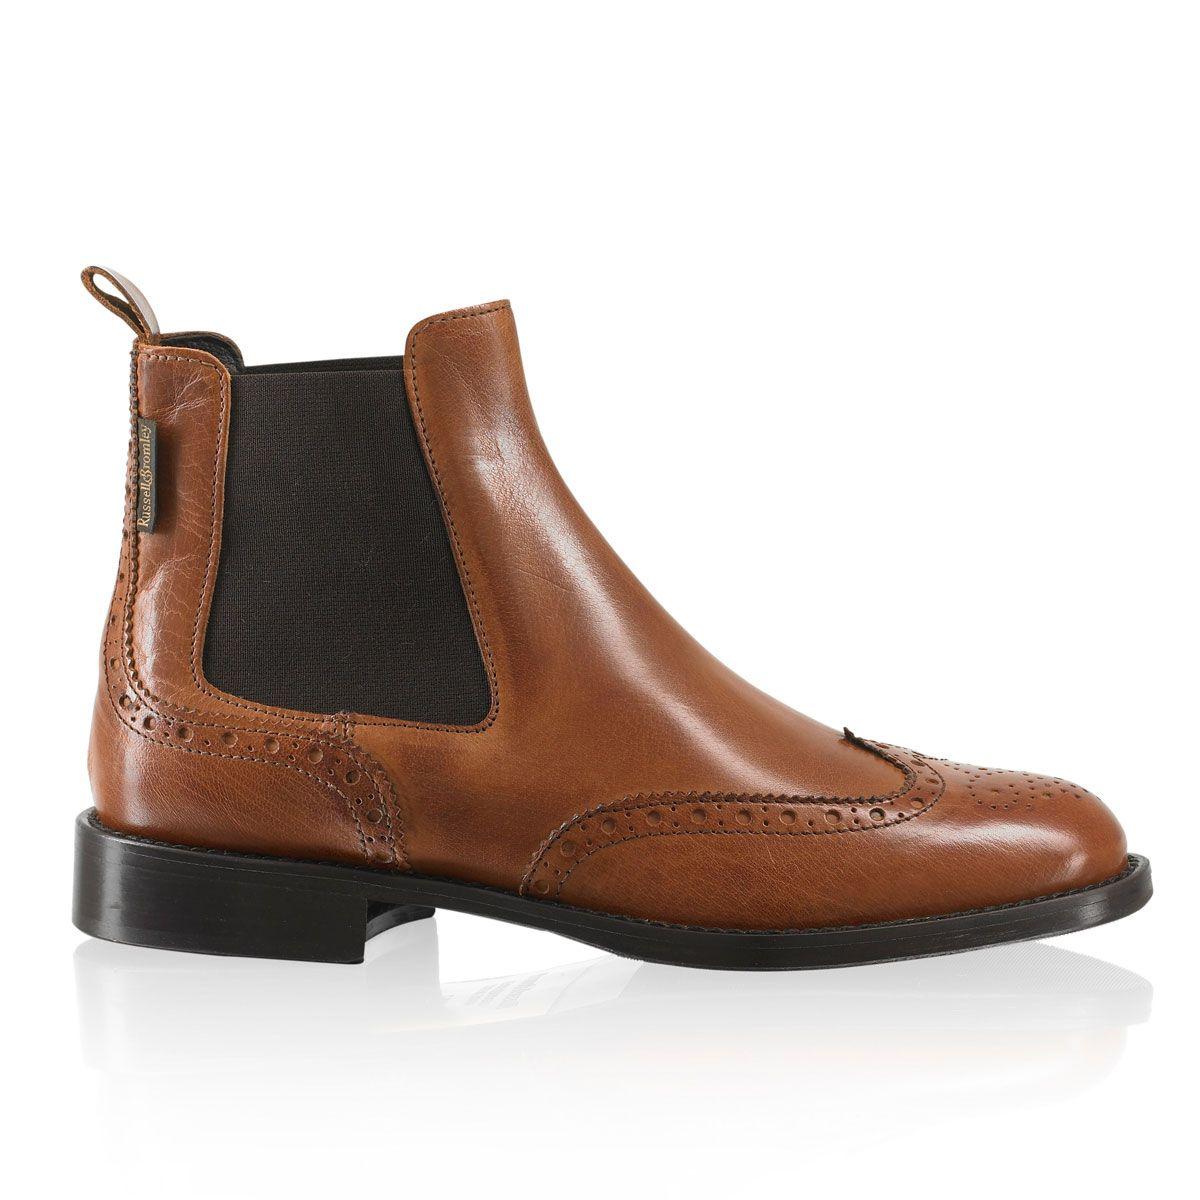 CADOGAN | Boots, Chelsea boots, Chelsea